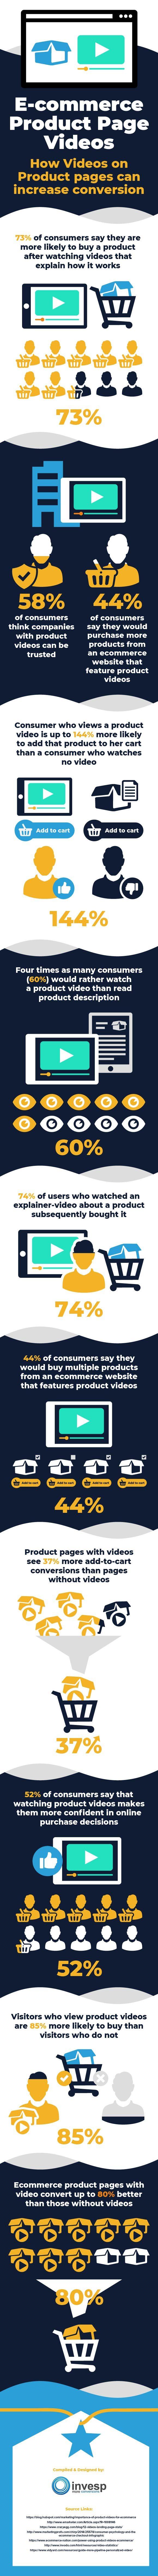 ecommerce_video_info